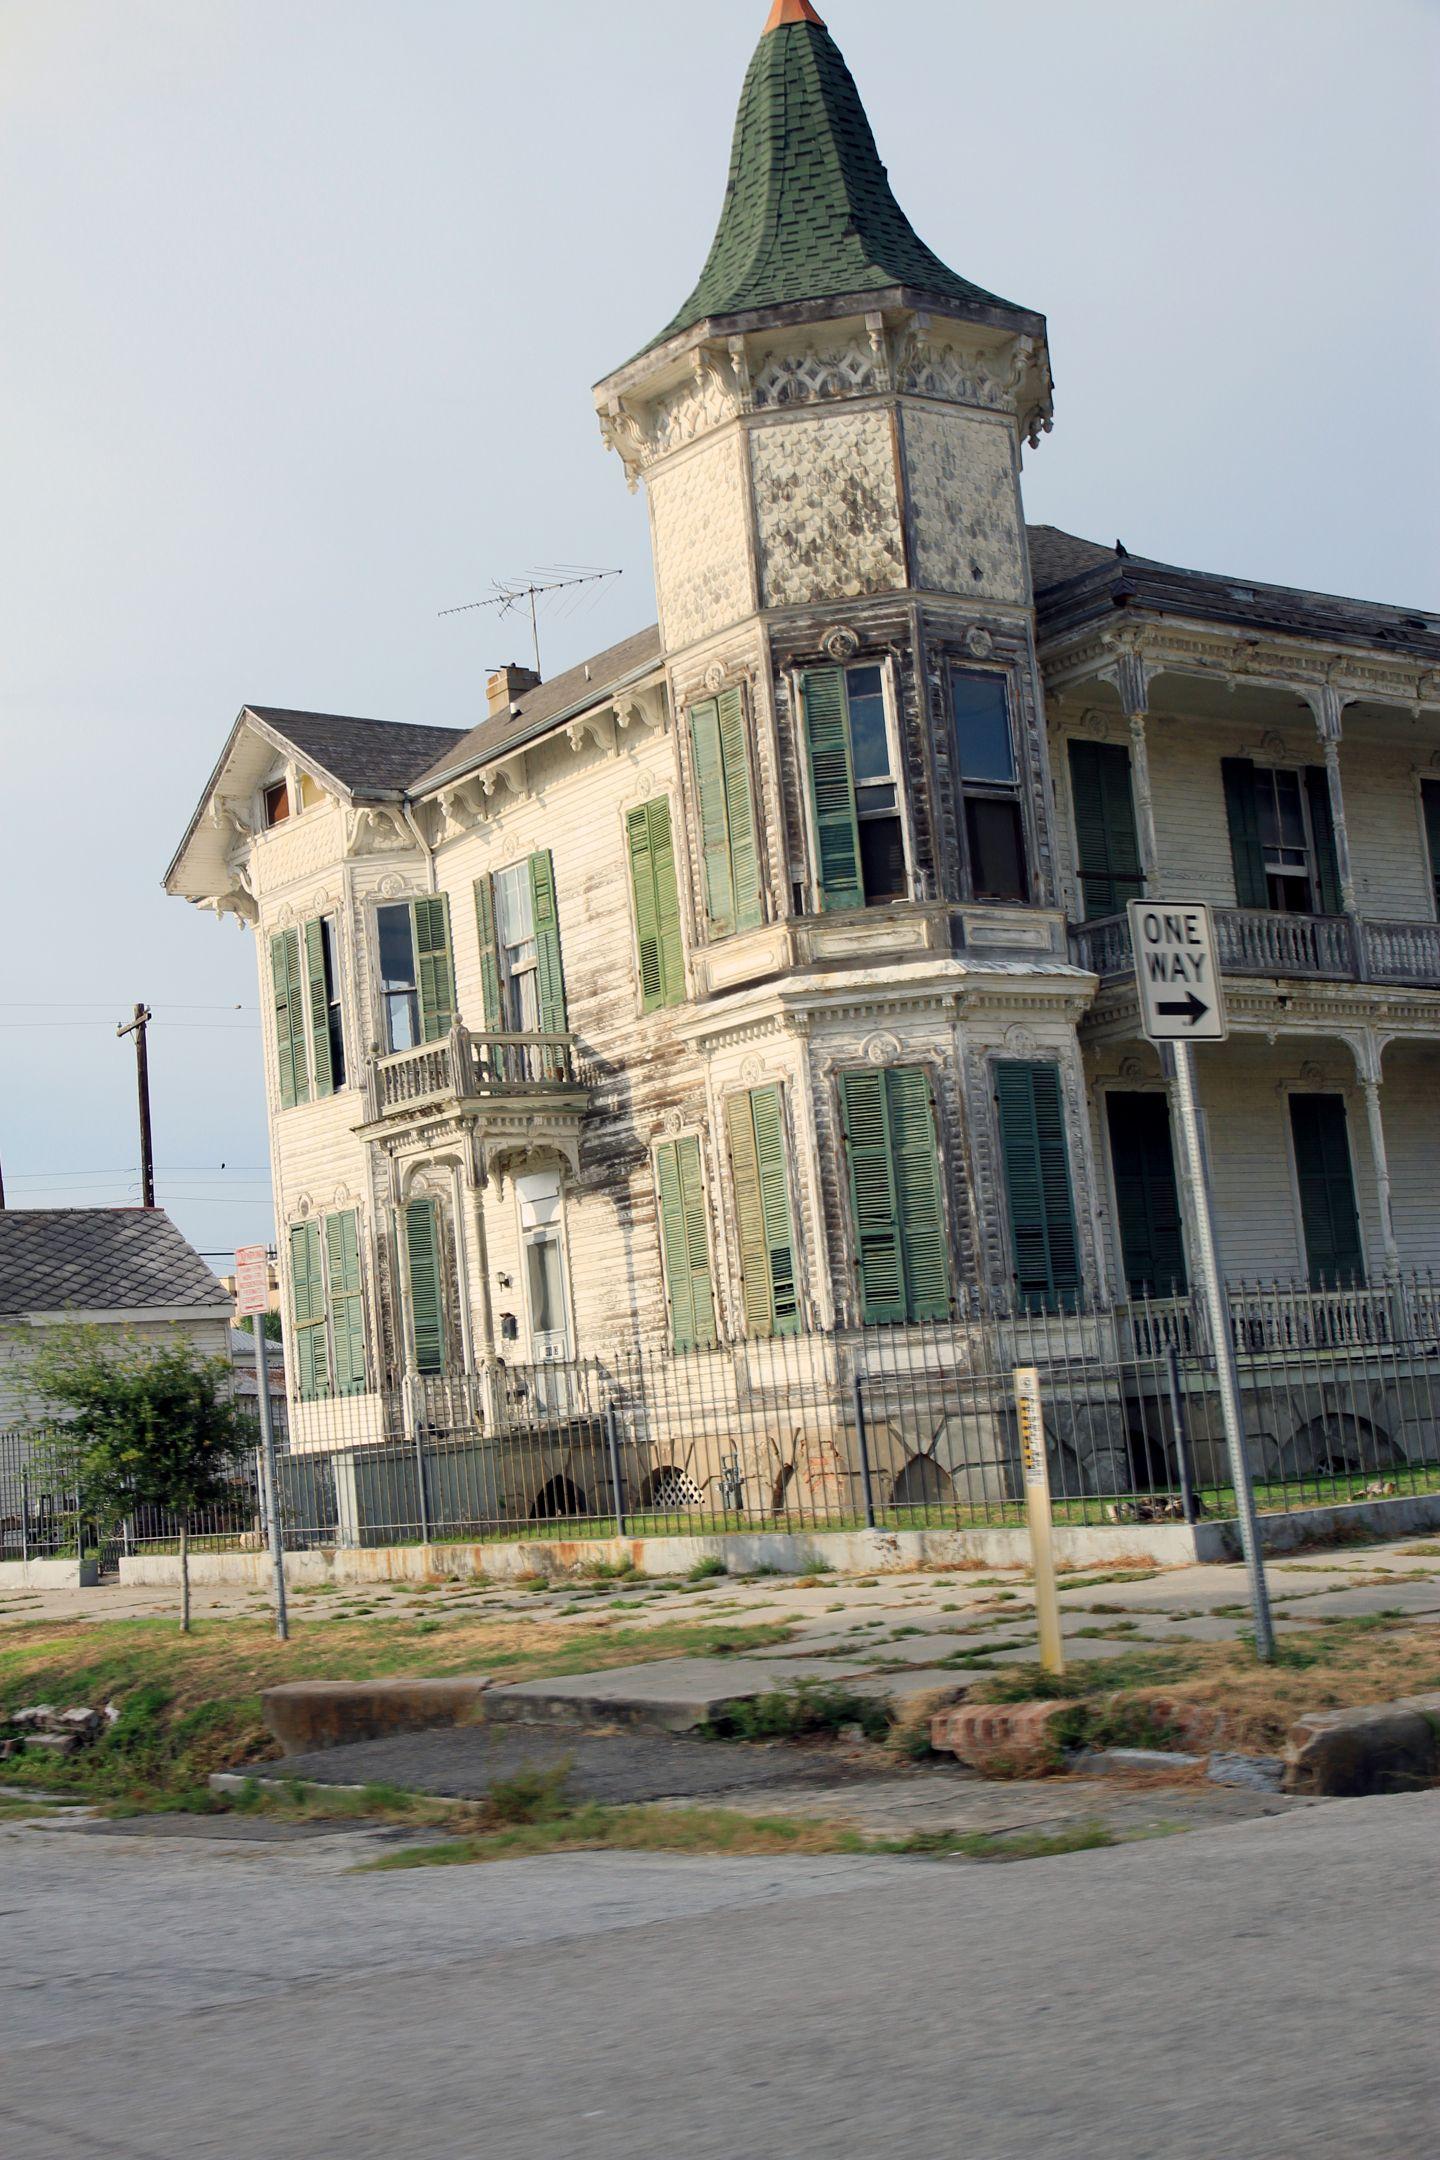 abandoned galveston texas haunted beach house i don t think abandoned galveston texas haunted beach house i don t think